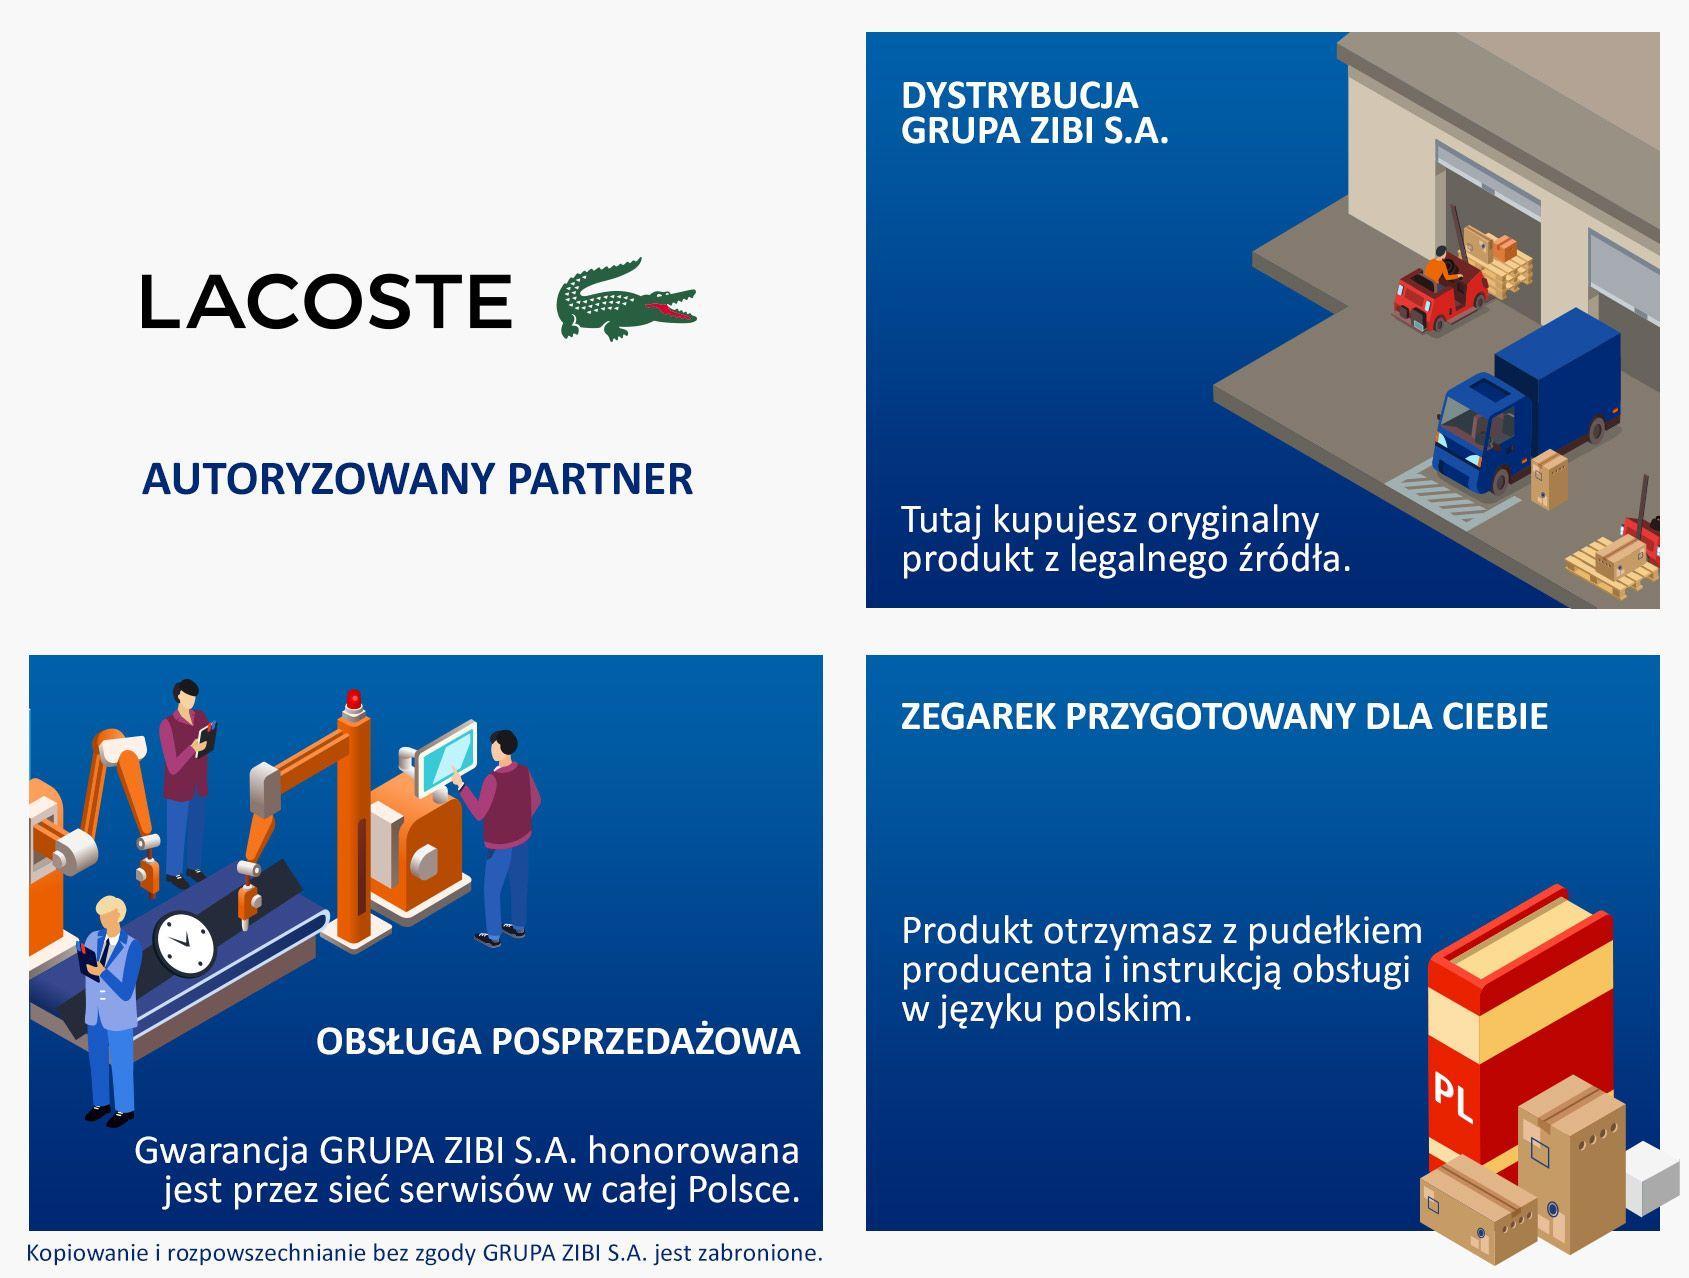 Autoryzowany Partner Lacoste